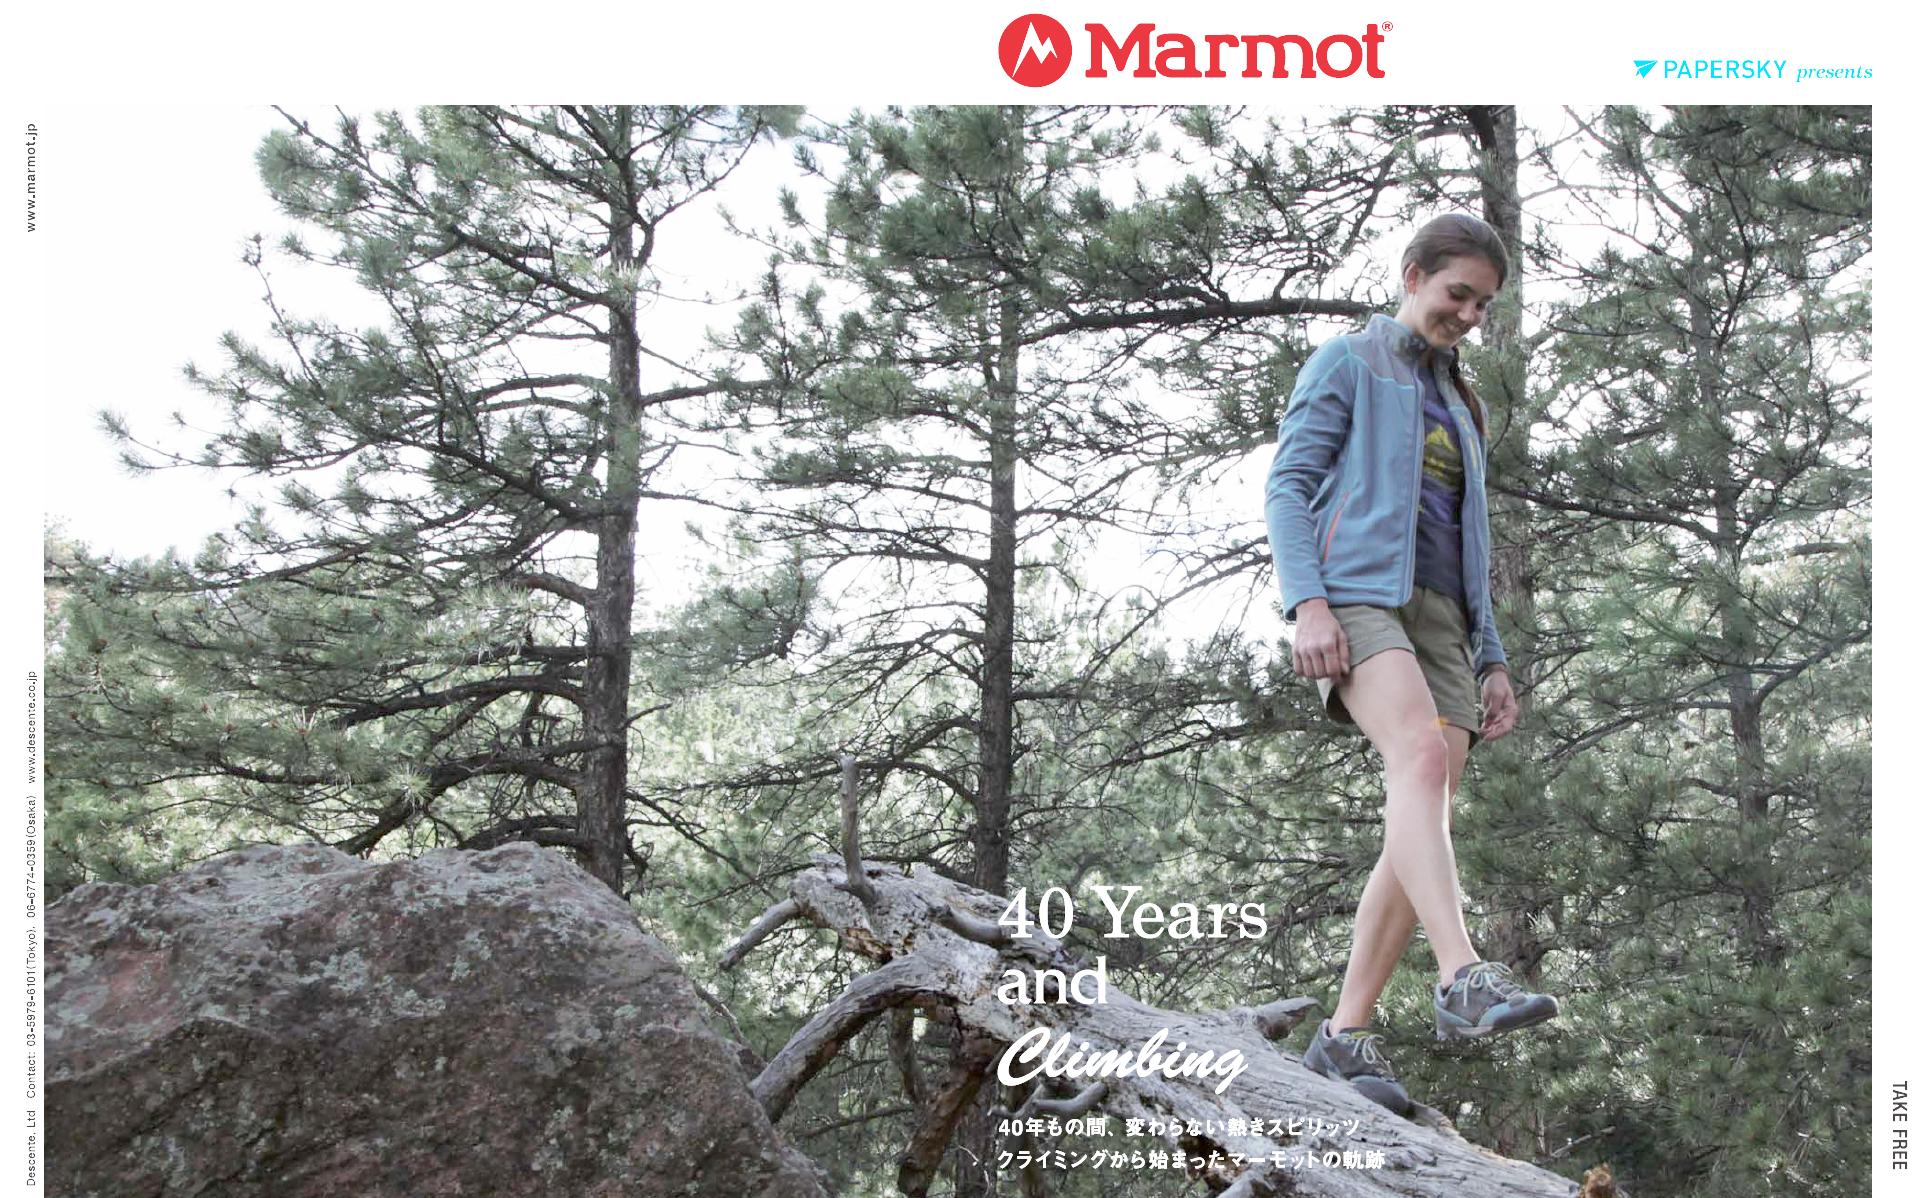 Marmot 2014